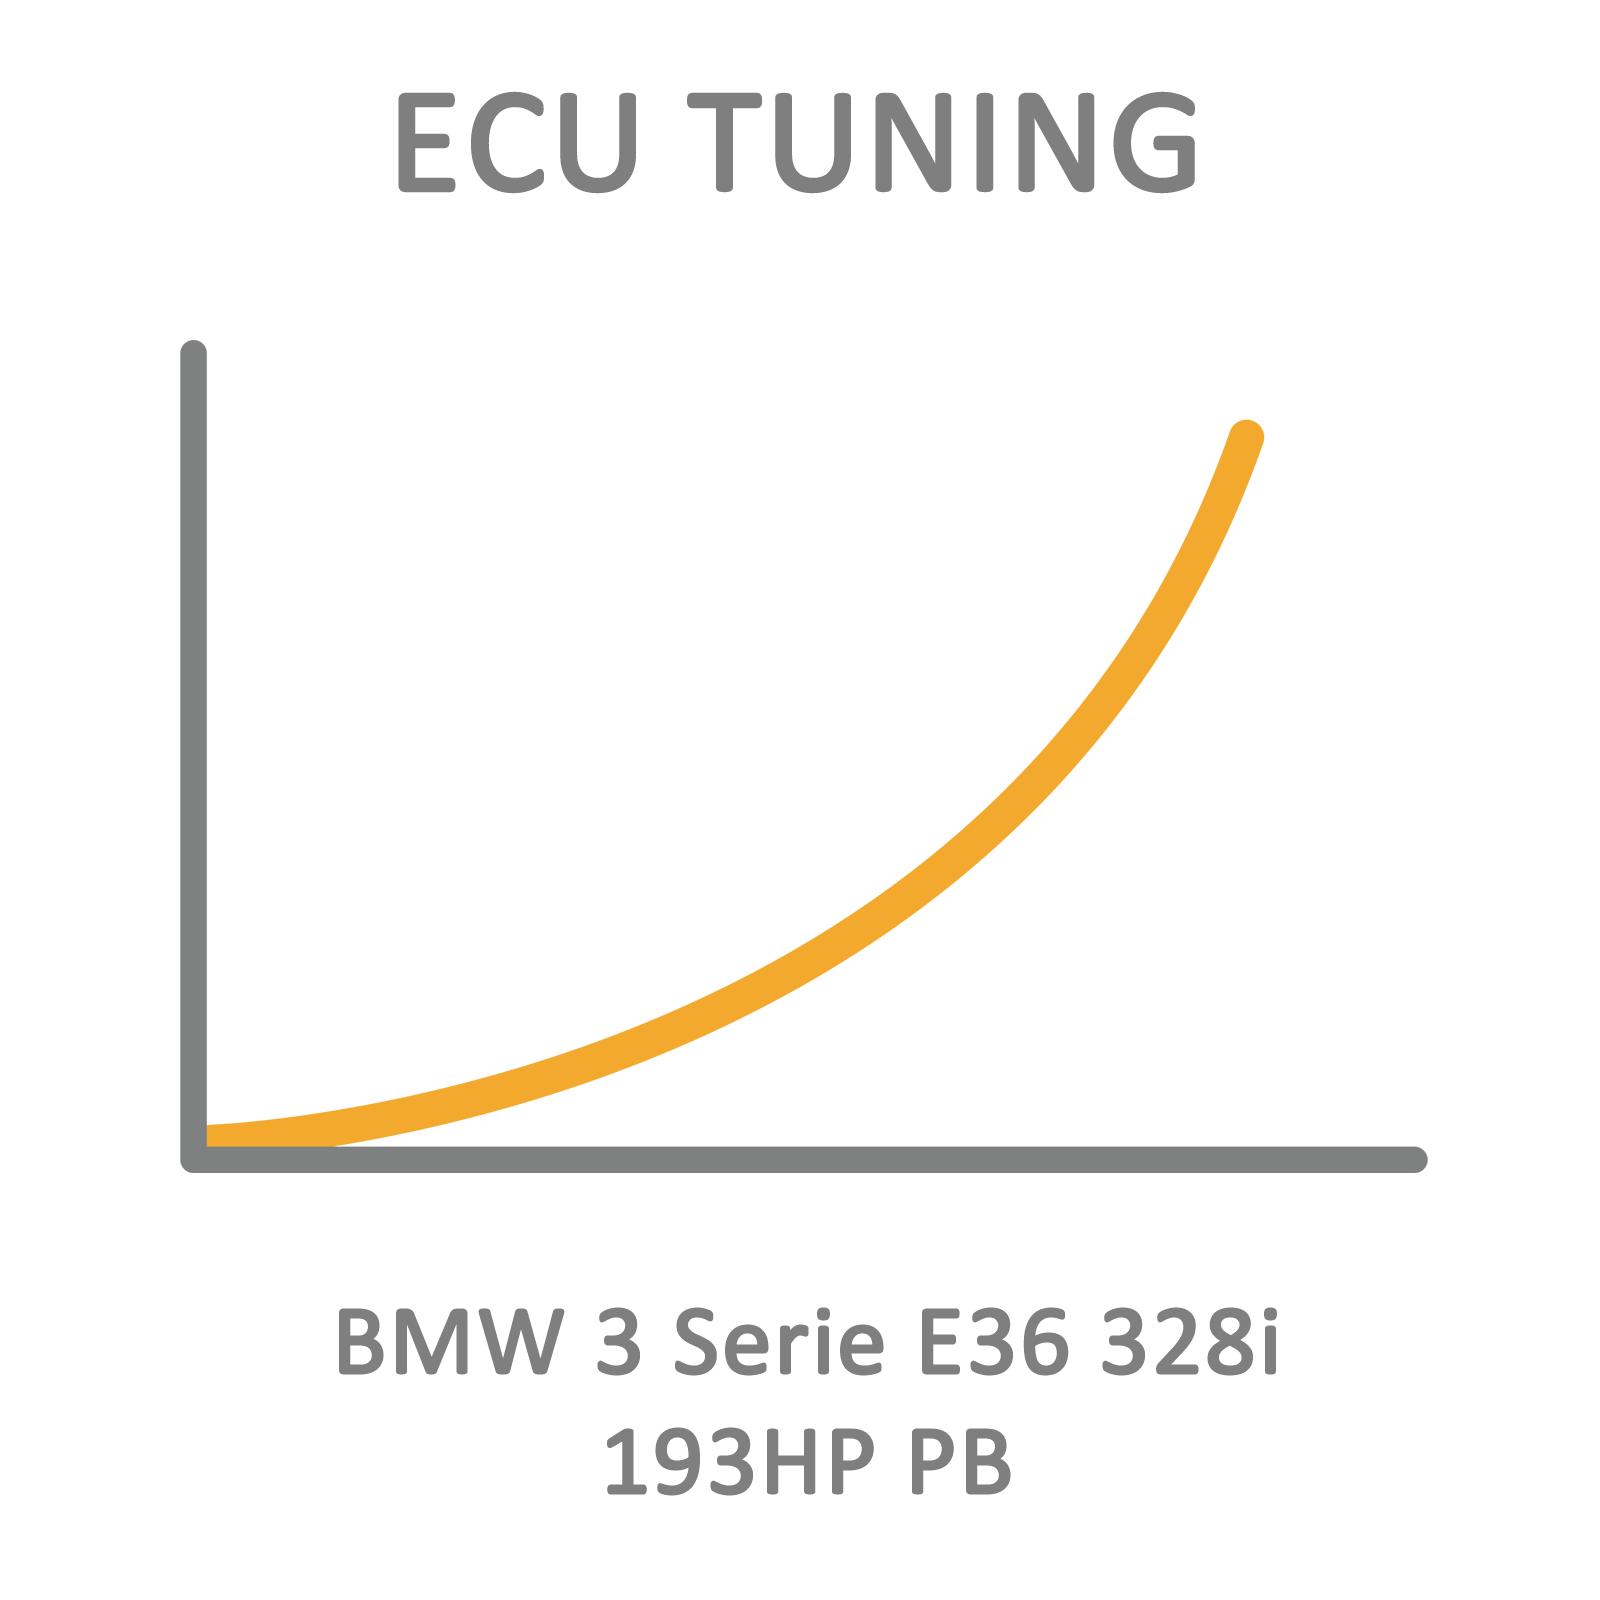 BMW 3 Series E36 328i 193HP PB ECU Tuning Remapping